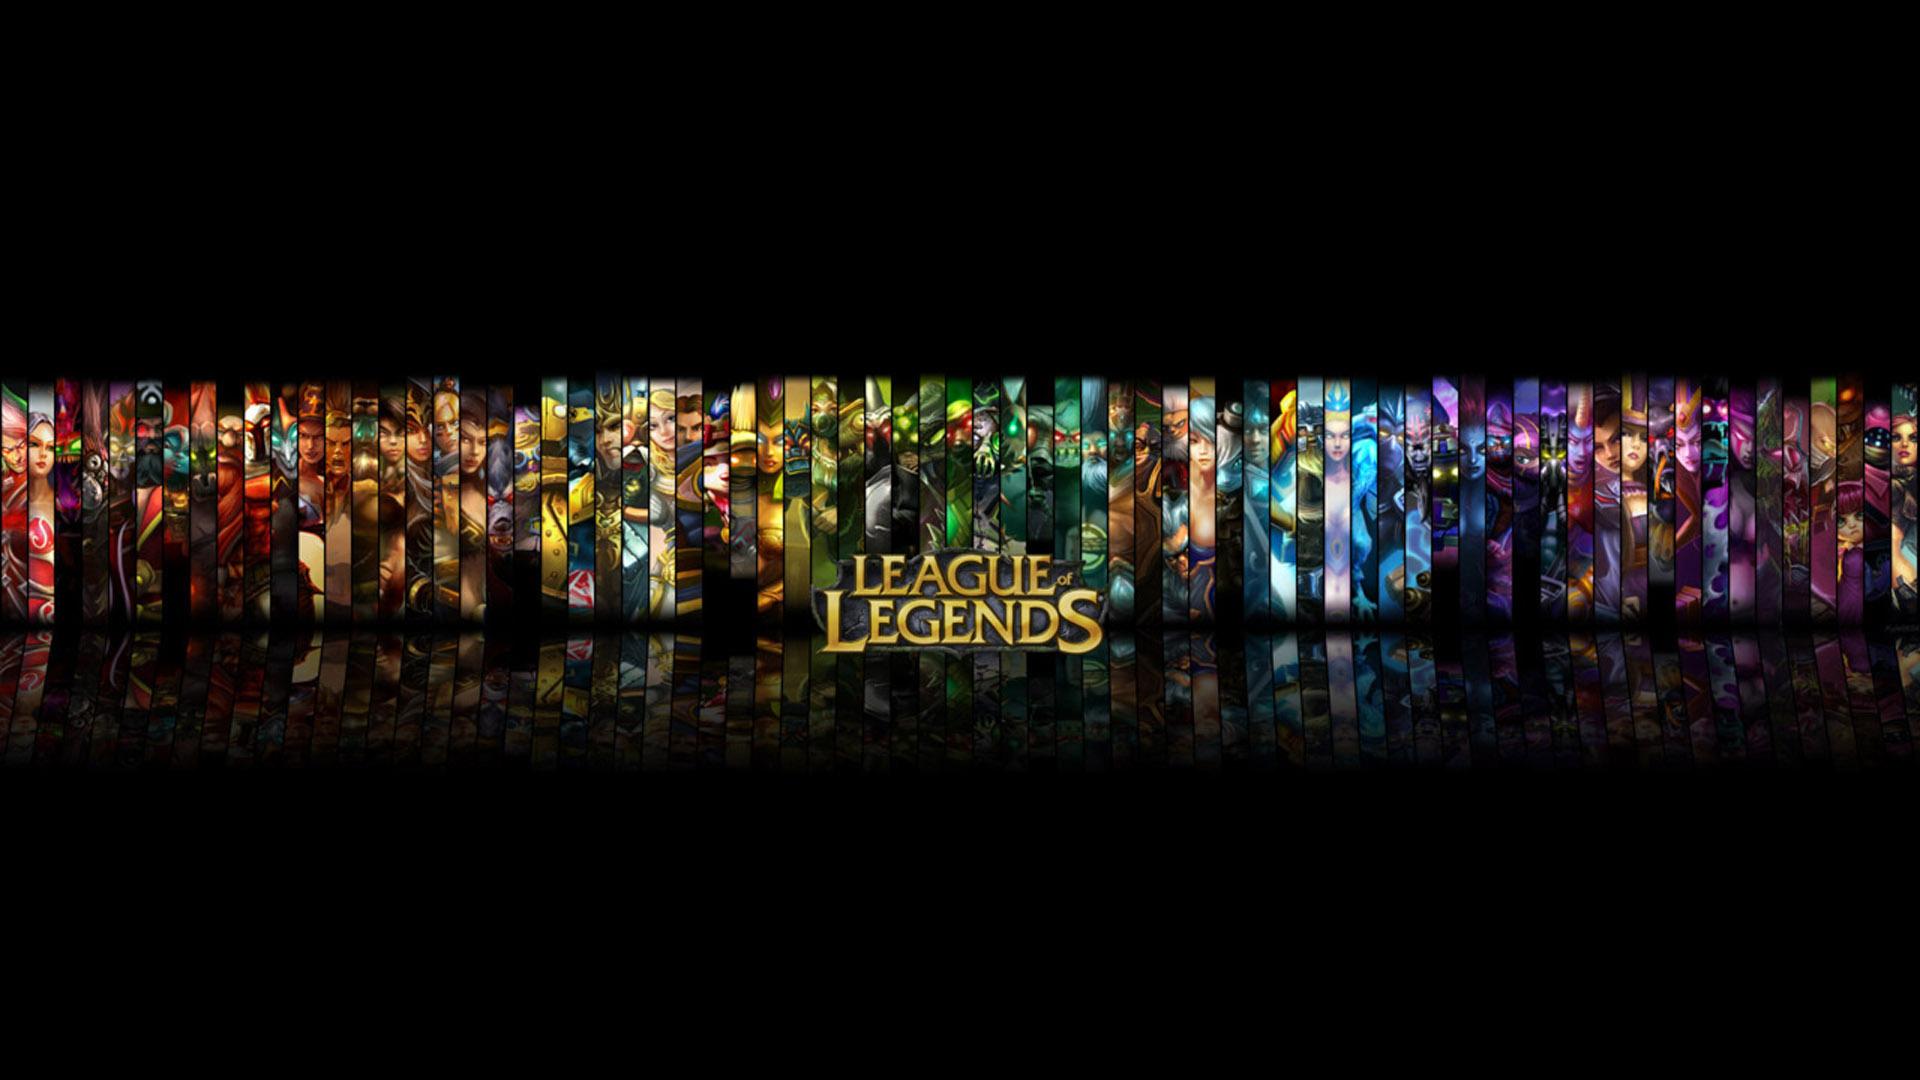 League of Legends Hero Collection HD Wallpaper FullHDWpp   Full HD 1920x1080